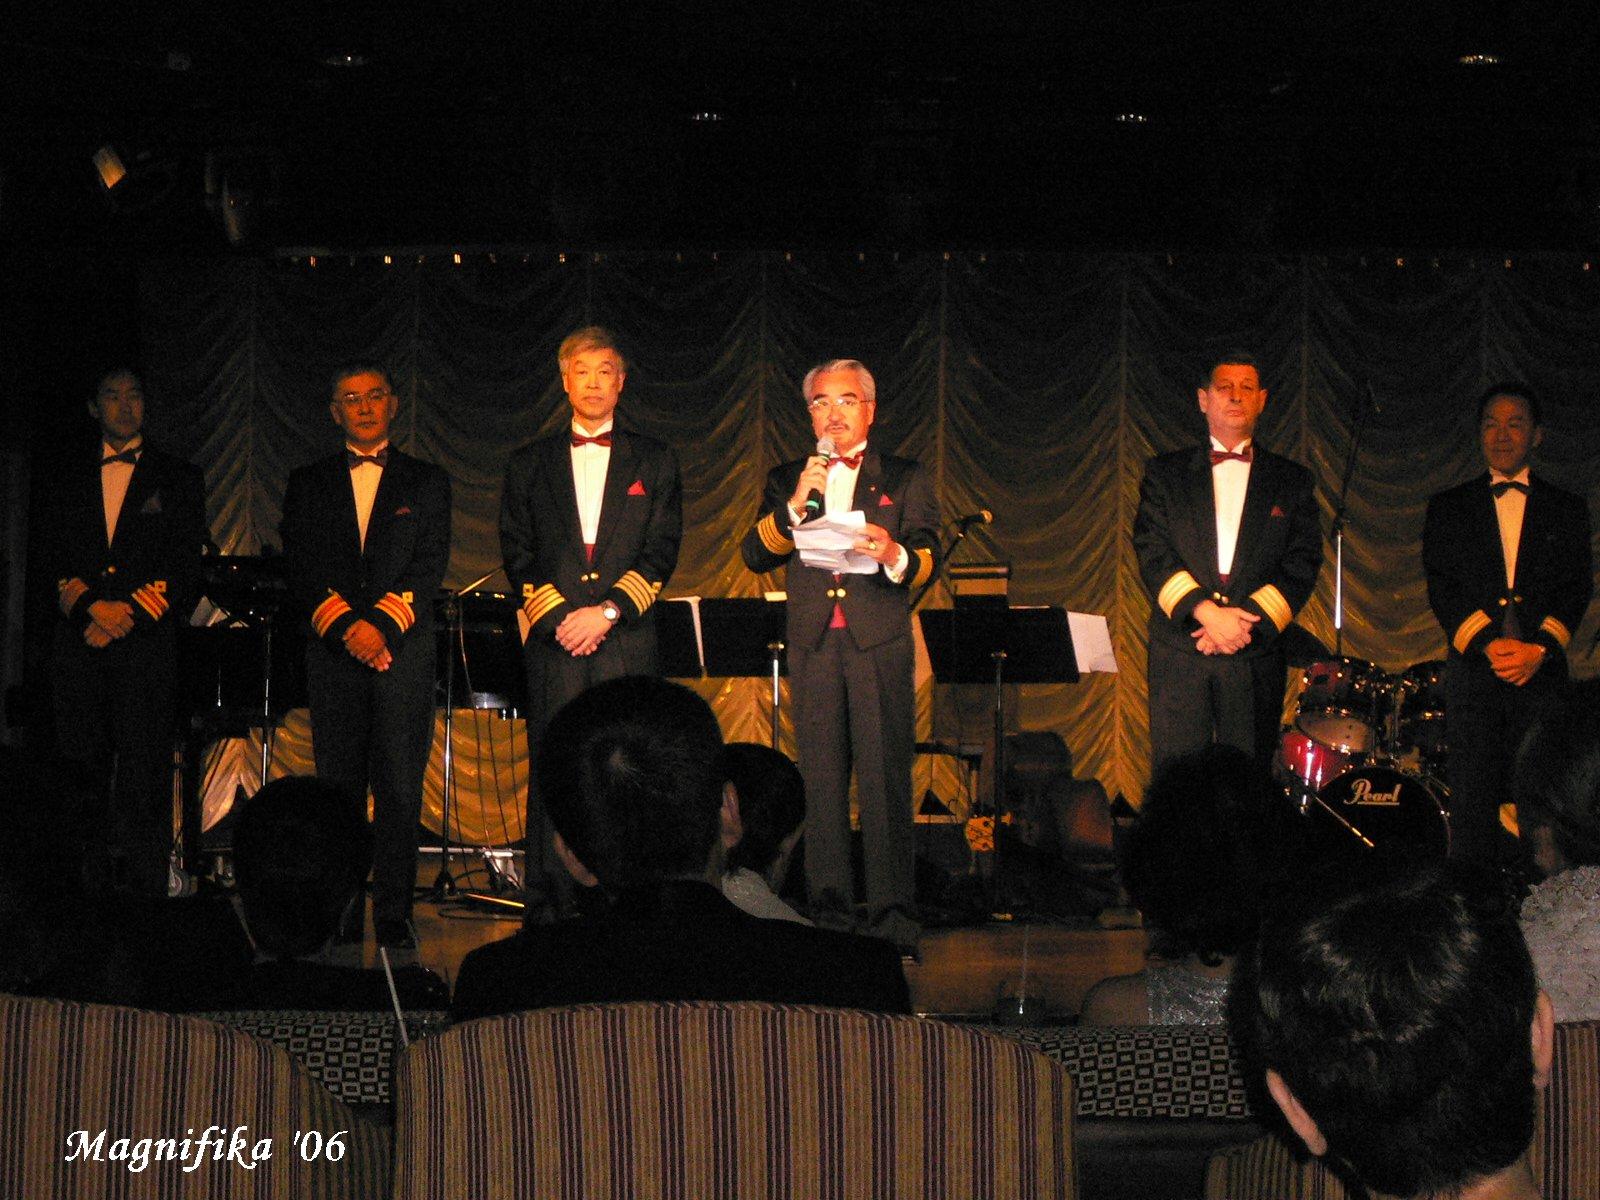 world cruise 2006 No.76 captain\'s farewell party / フェアウエル・パーティ_e0140365_17294985.jpg